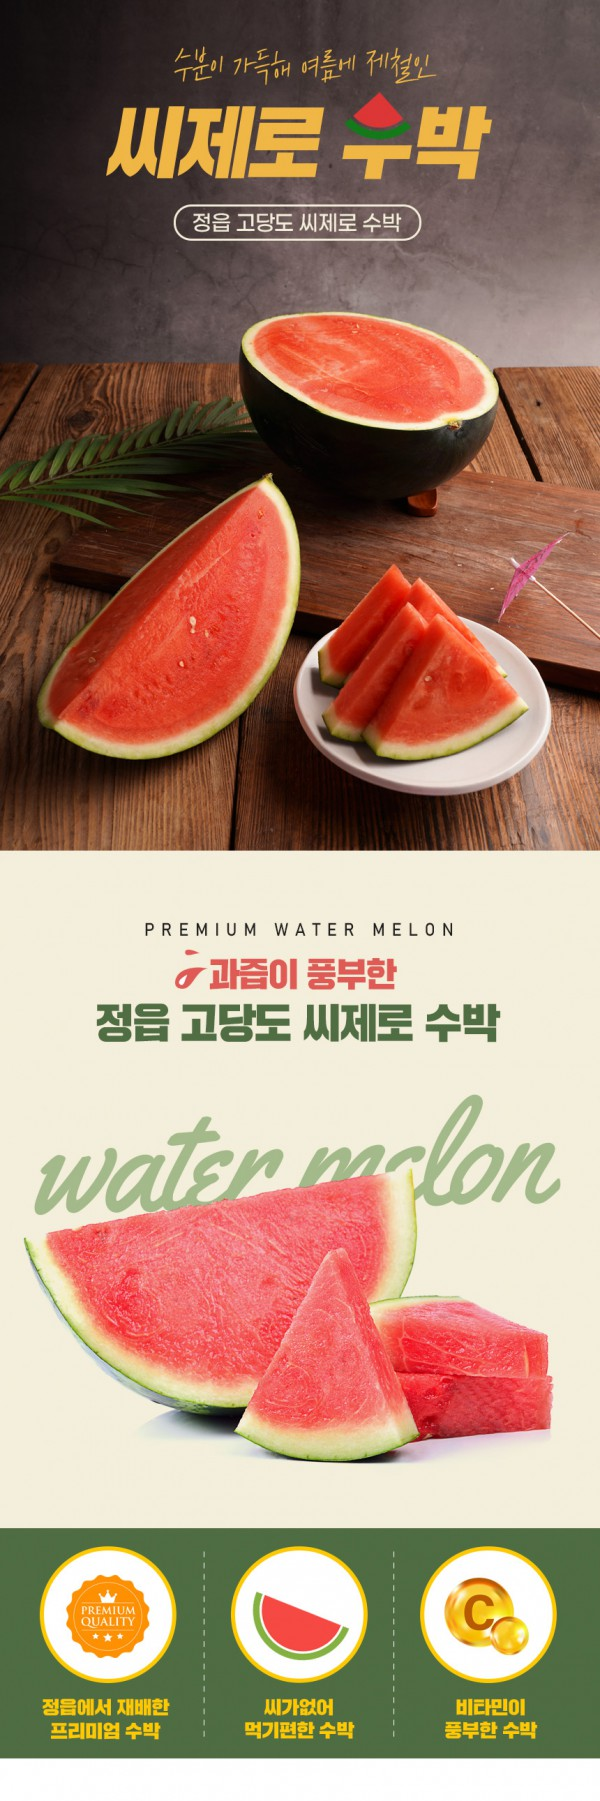 [T014]과일 수박 상세페이지 + 제품촬영